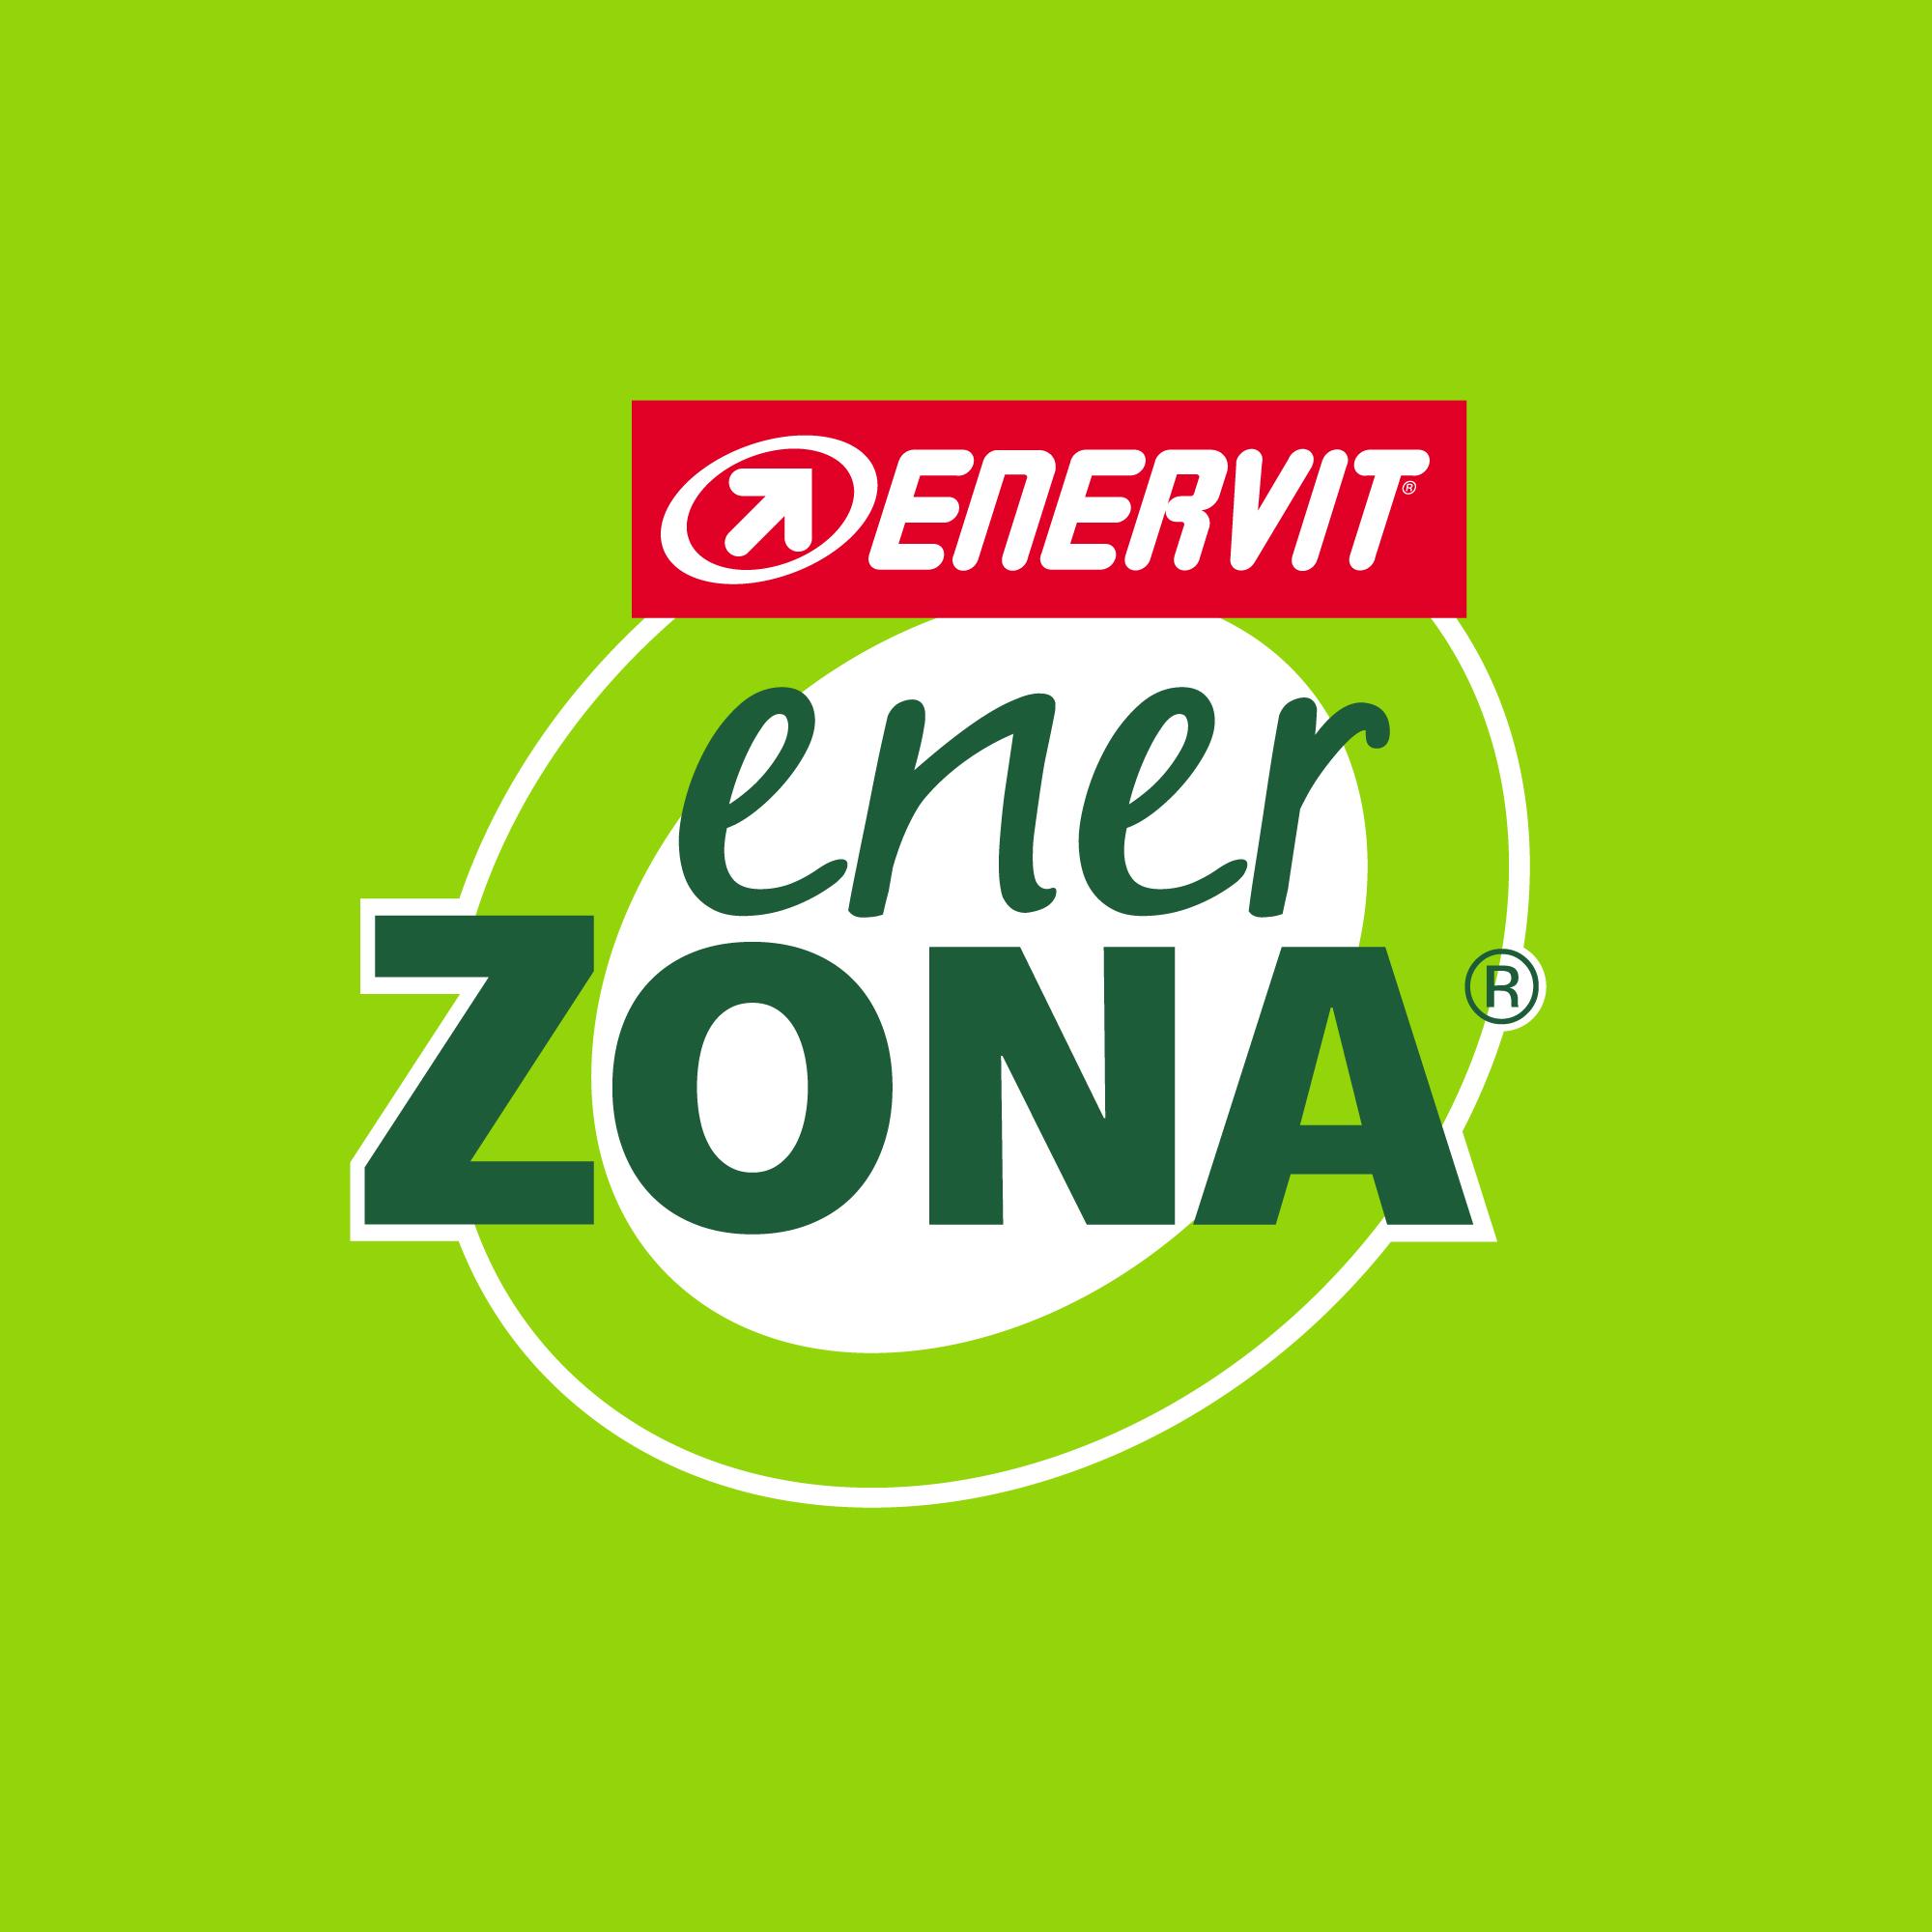 ENERZONA logo